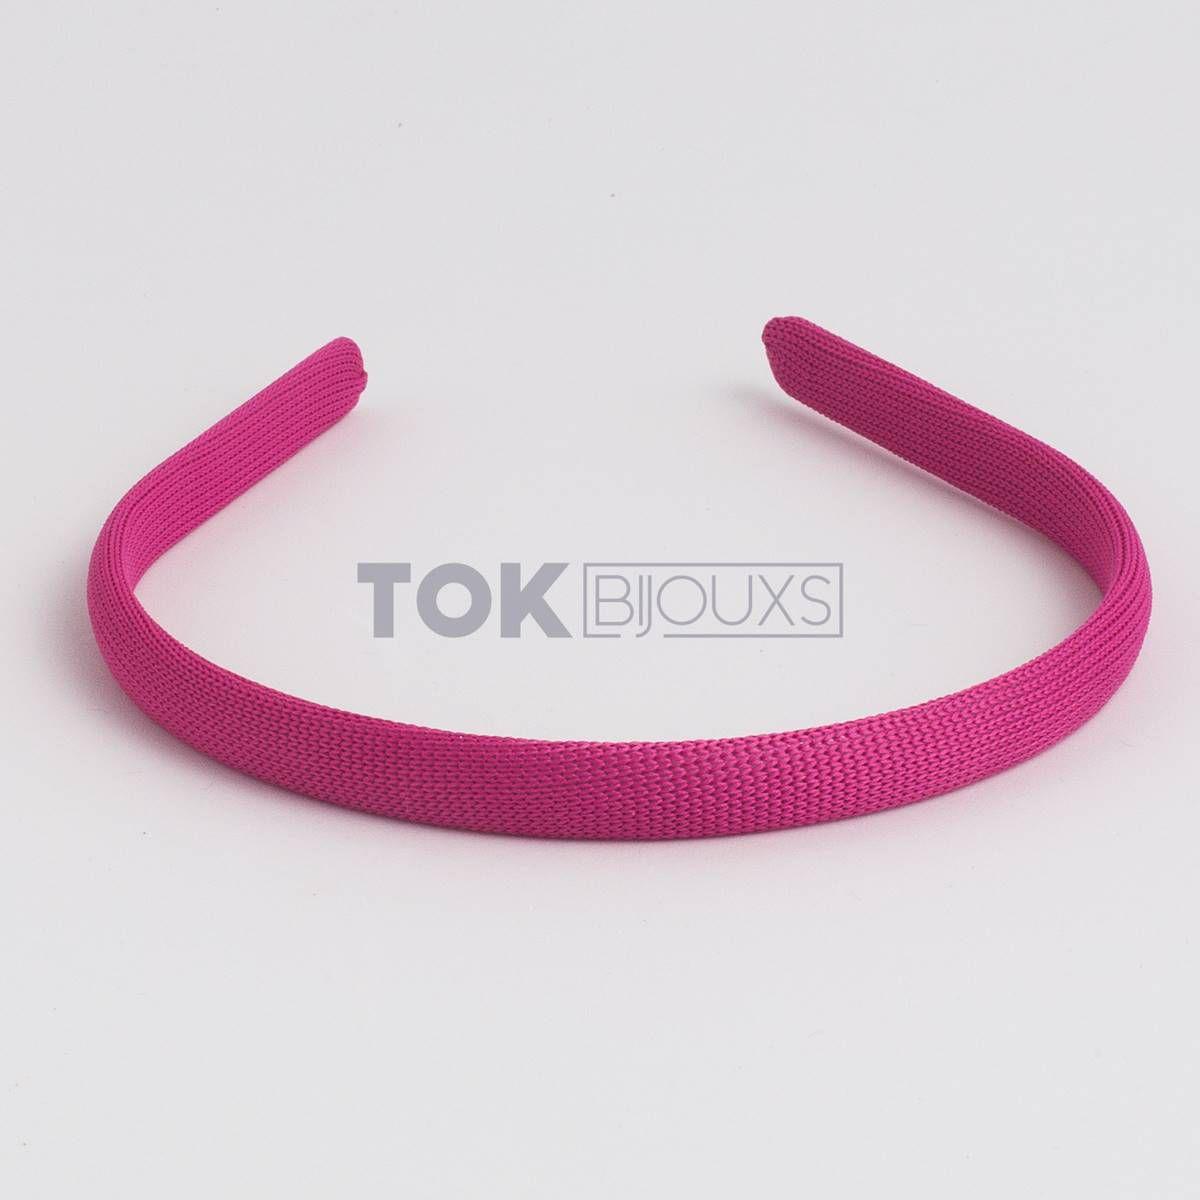 Tiaras Encapadas 10mm Pink - 12  Unid